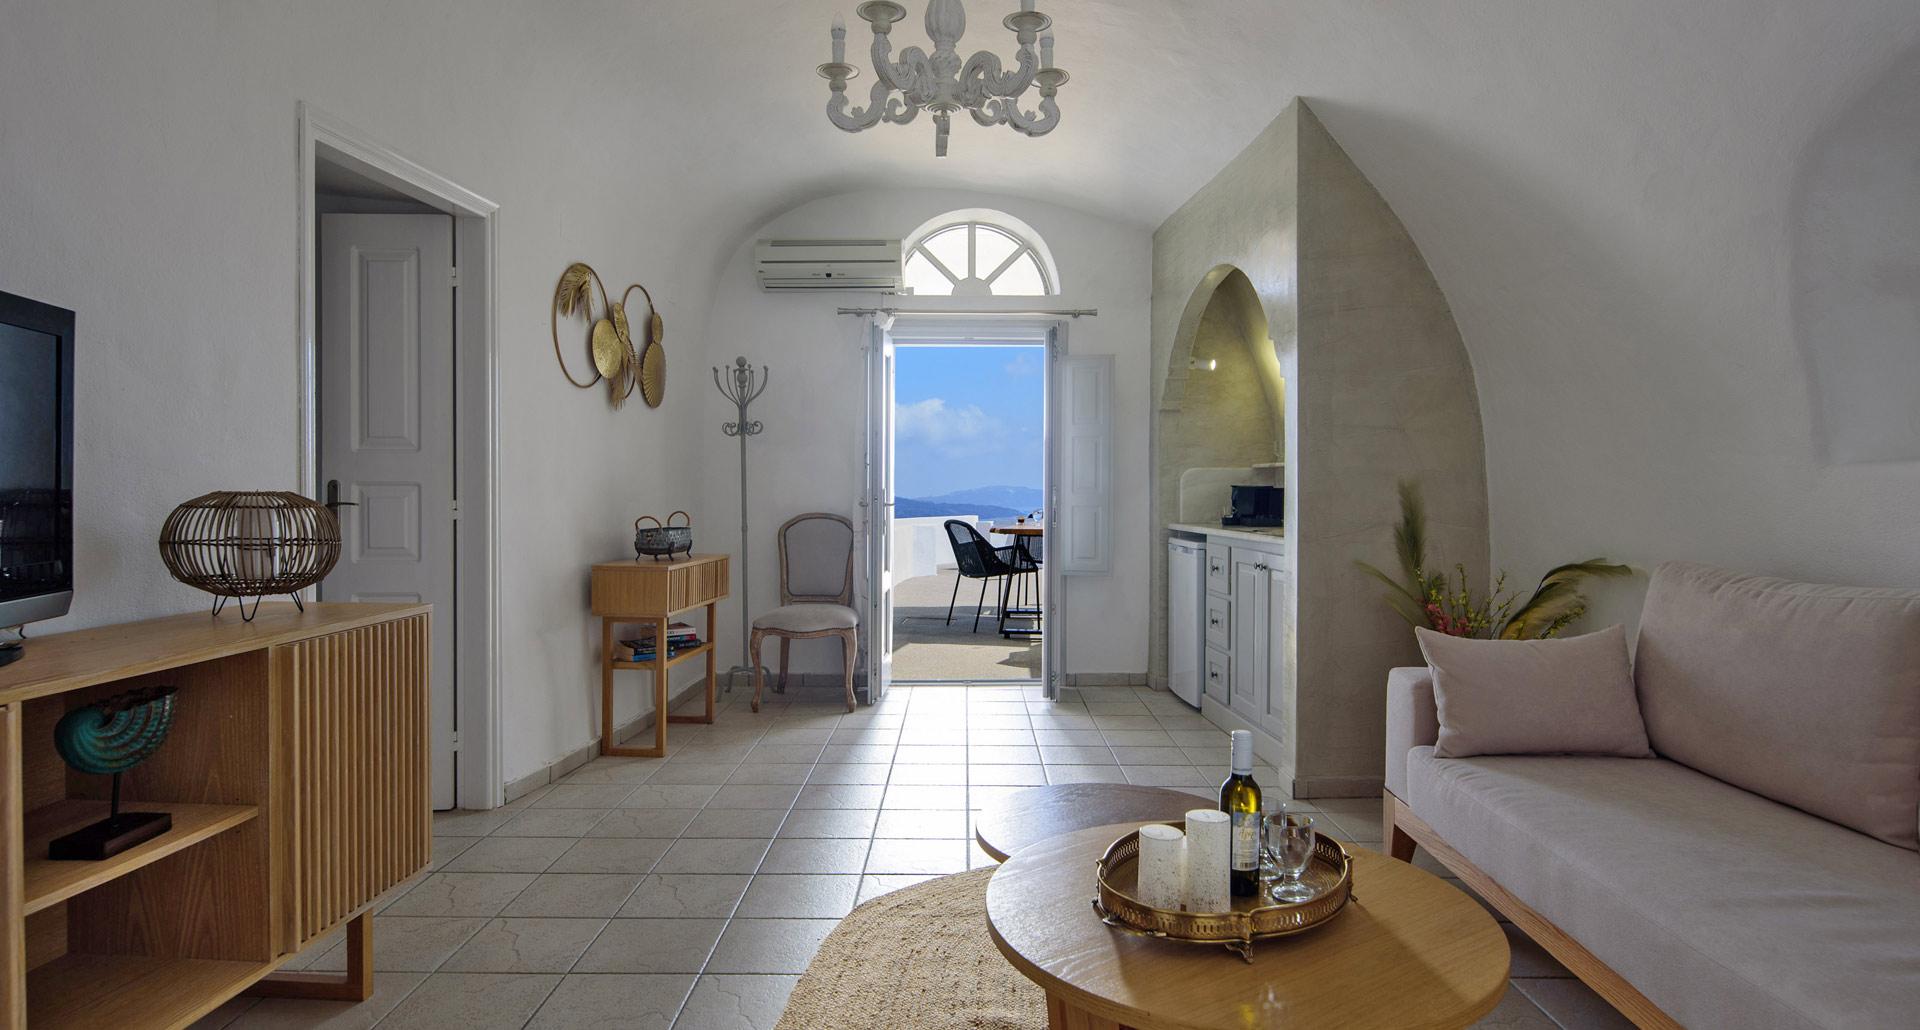 Oia Santorini Accommodation, Apartments, Studios to Rent